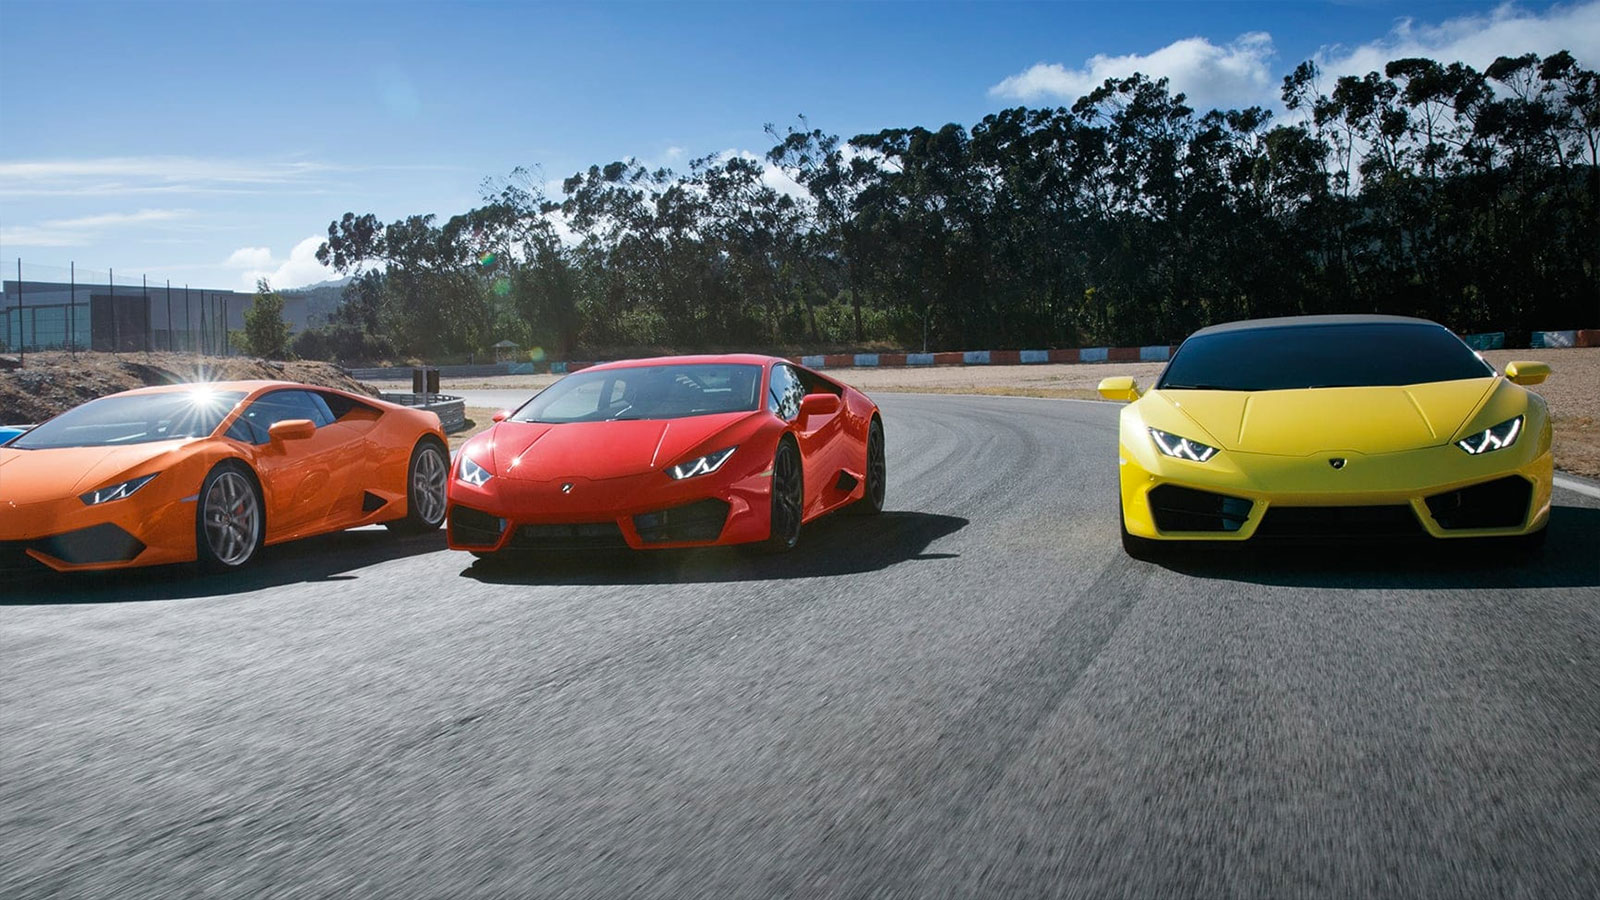 Lamborghini Huracan RWD Spyder - Breathtaking Technology image 5